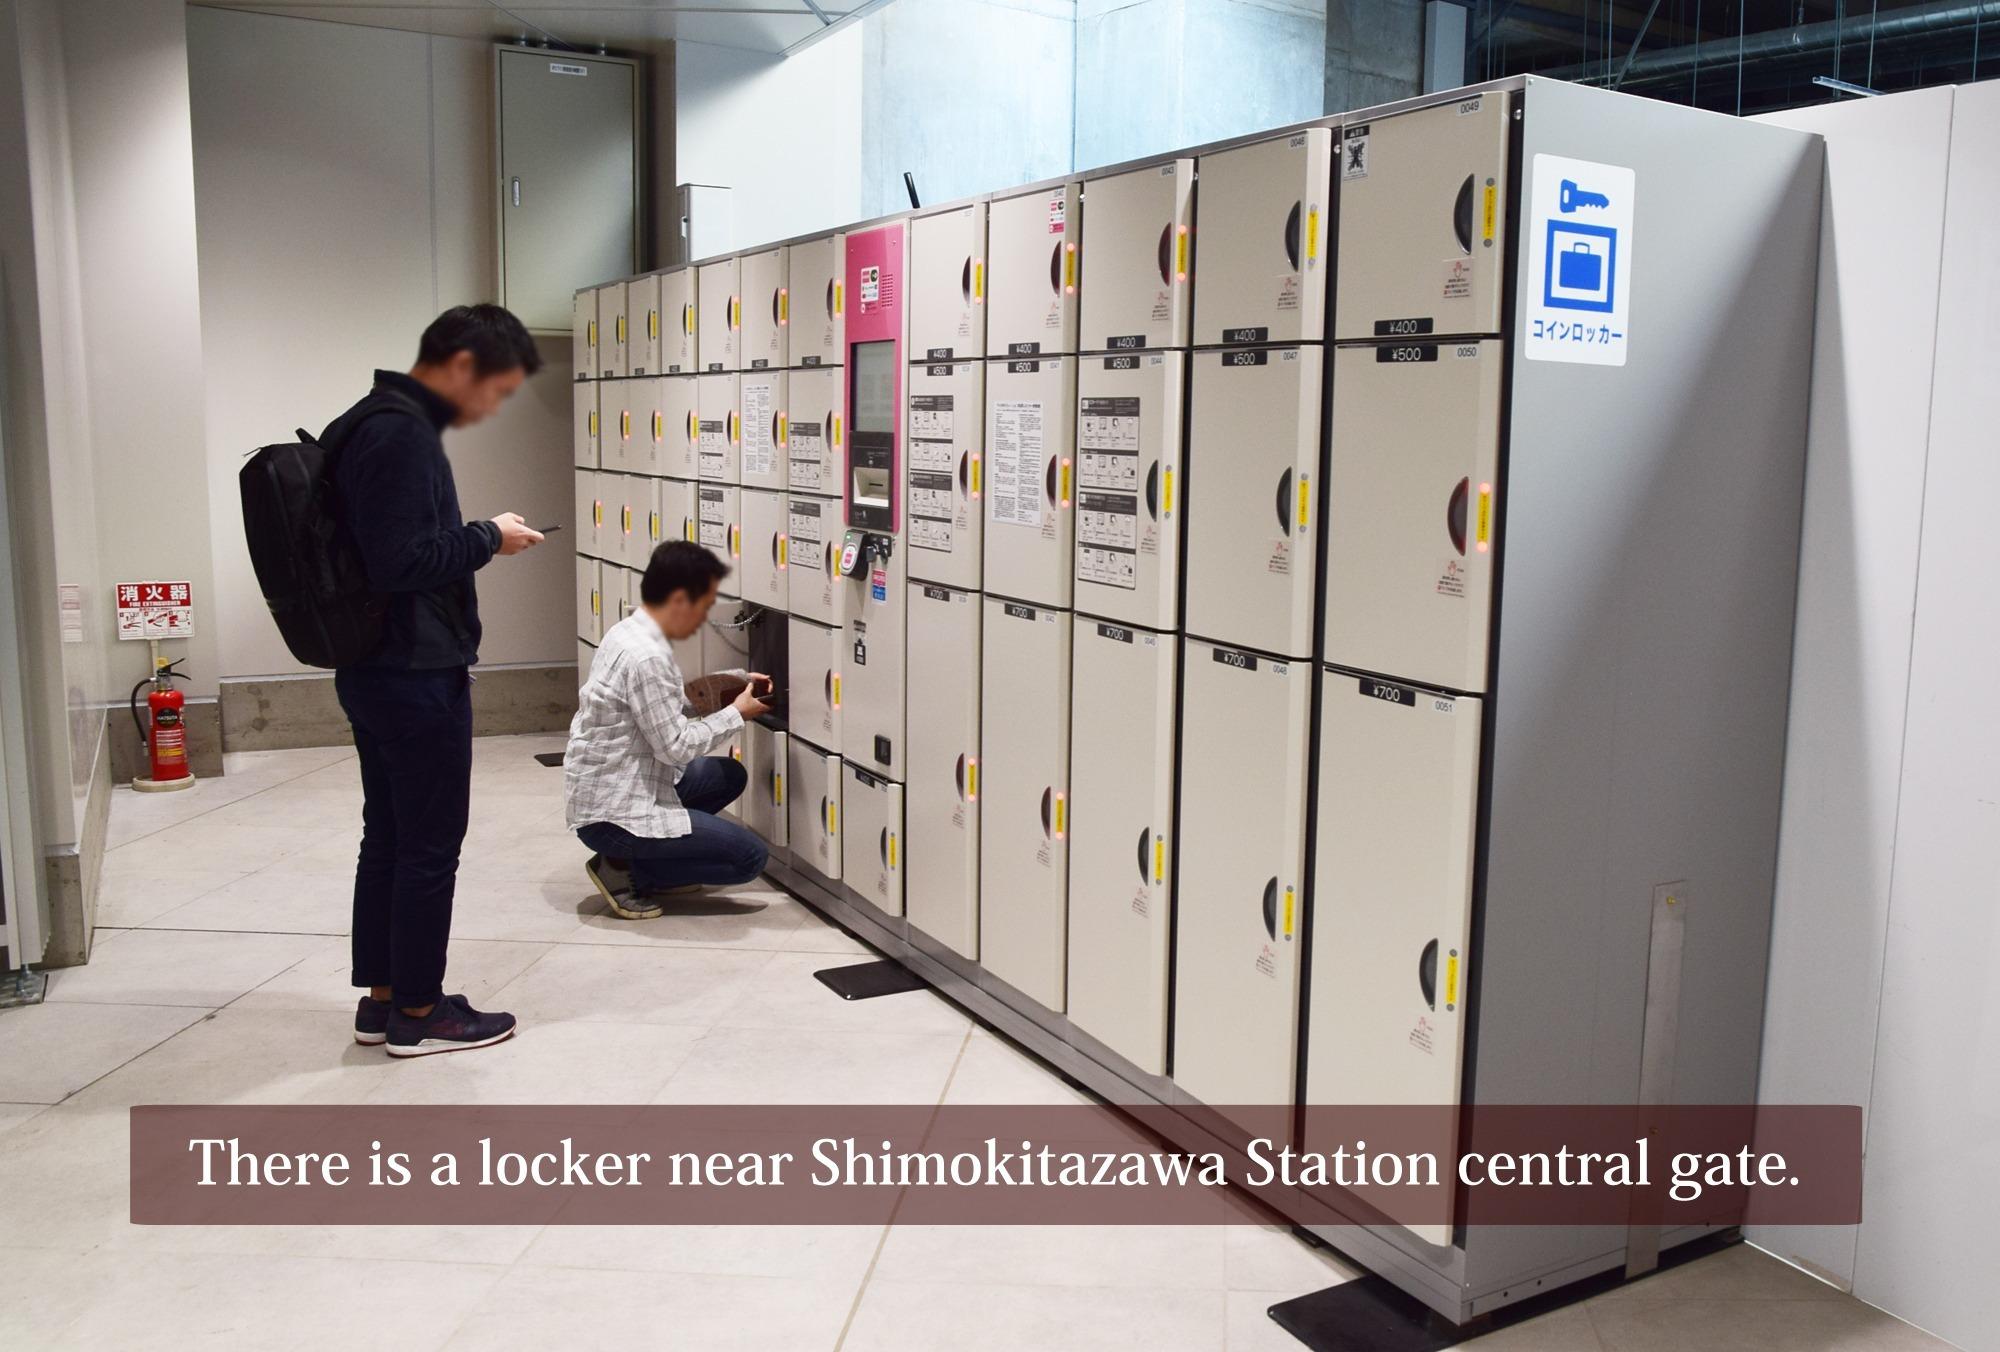 There is a big coin locker at the shimokitazawa station.